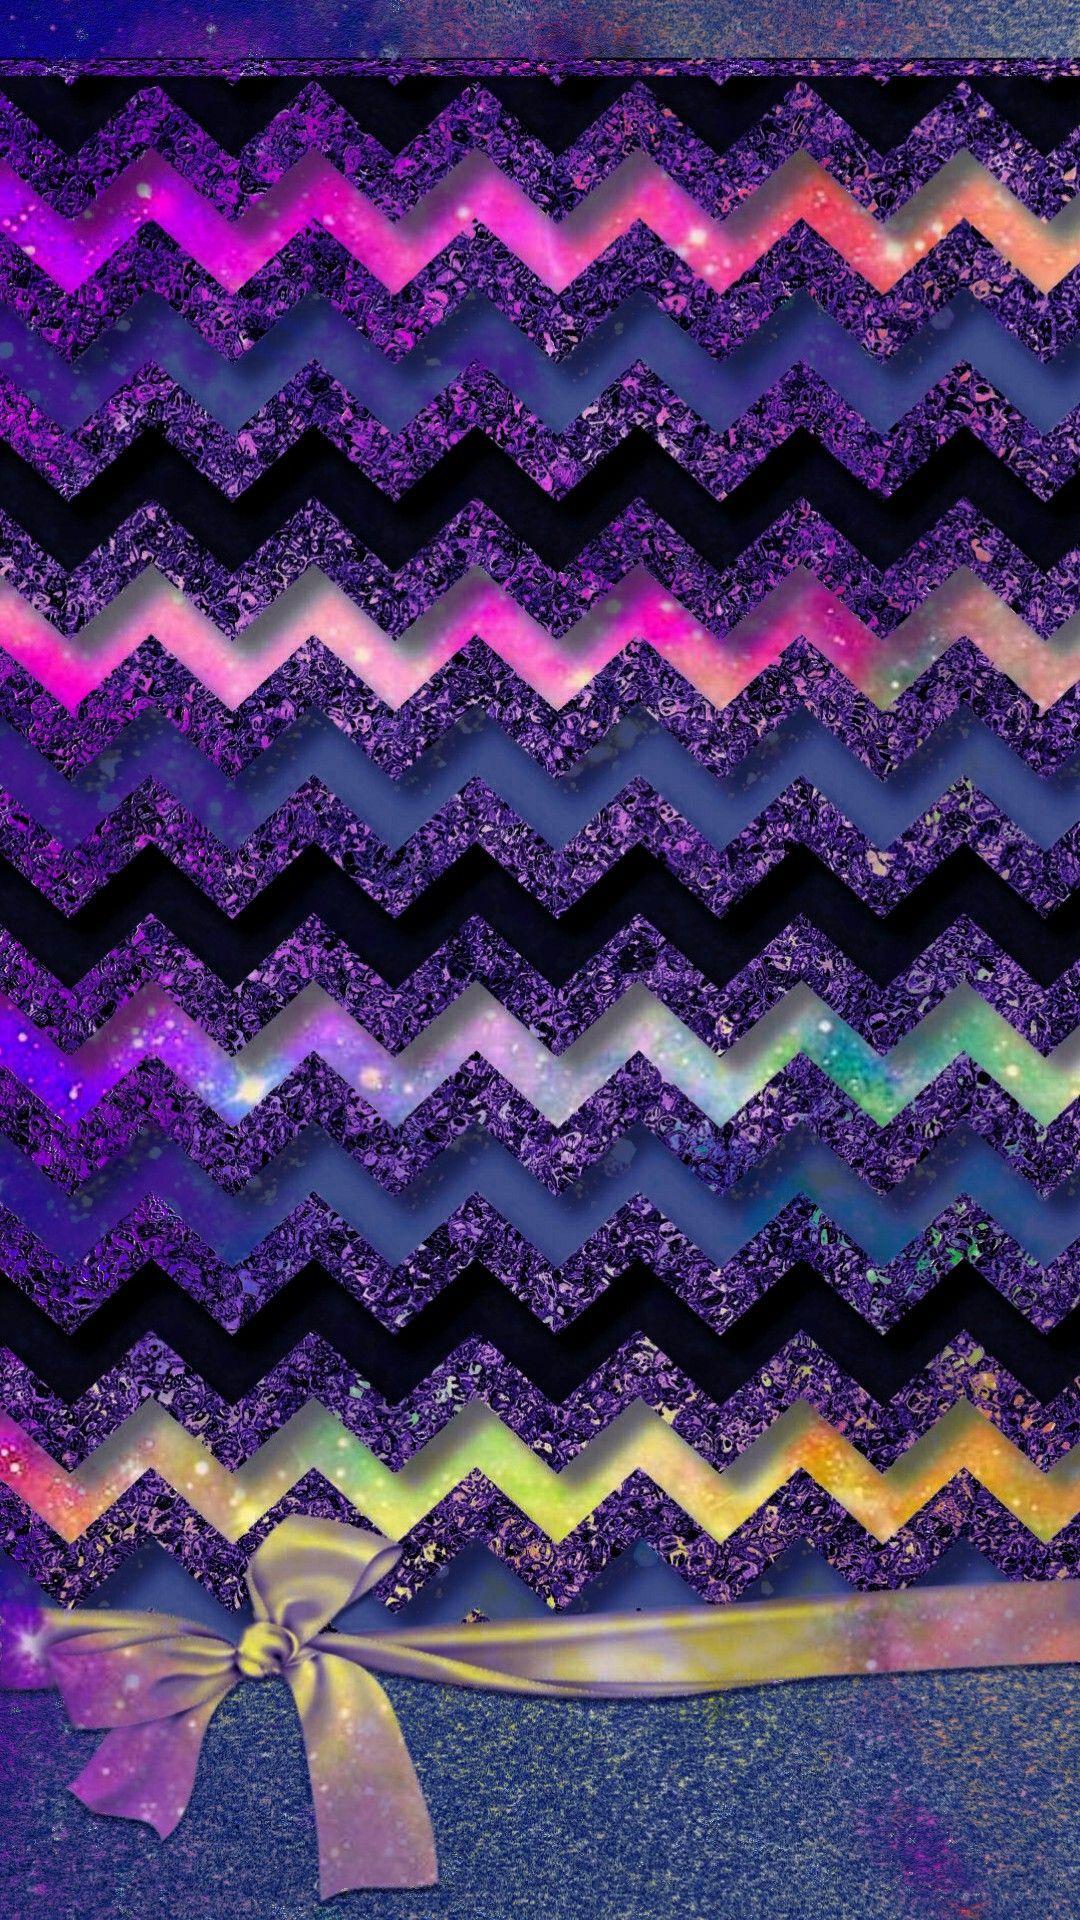 Glittery Chevron Design Blue Ver Made By Me Blue Glitter Chevron Patterns Sparkles Bows Wal Chevron Phone Wallpapers Chevron Wallpaper Bling Wallpaper